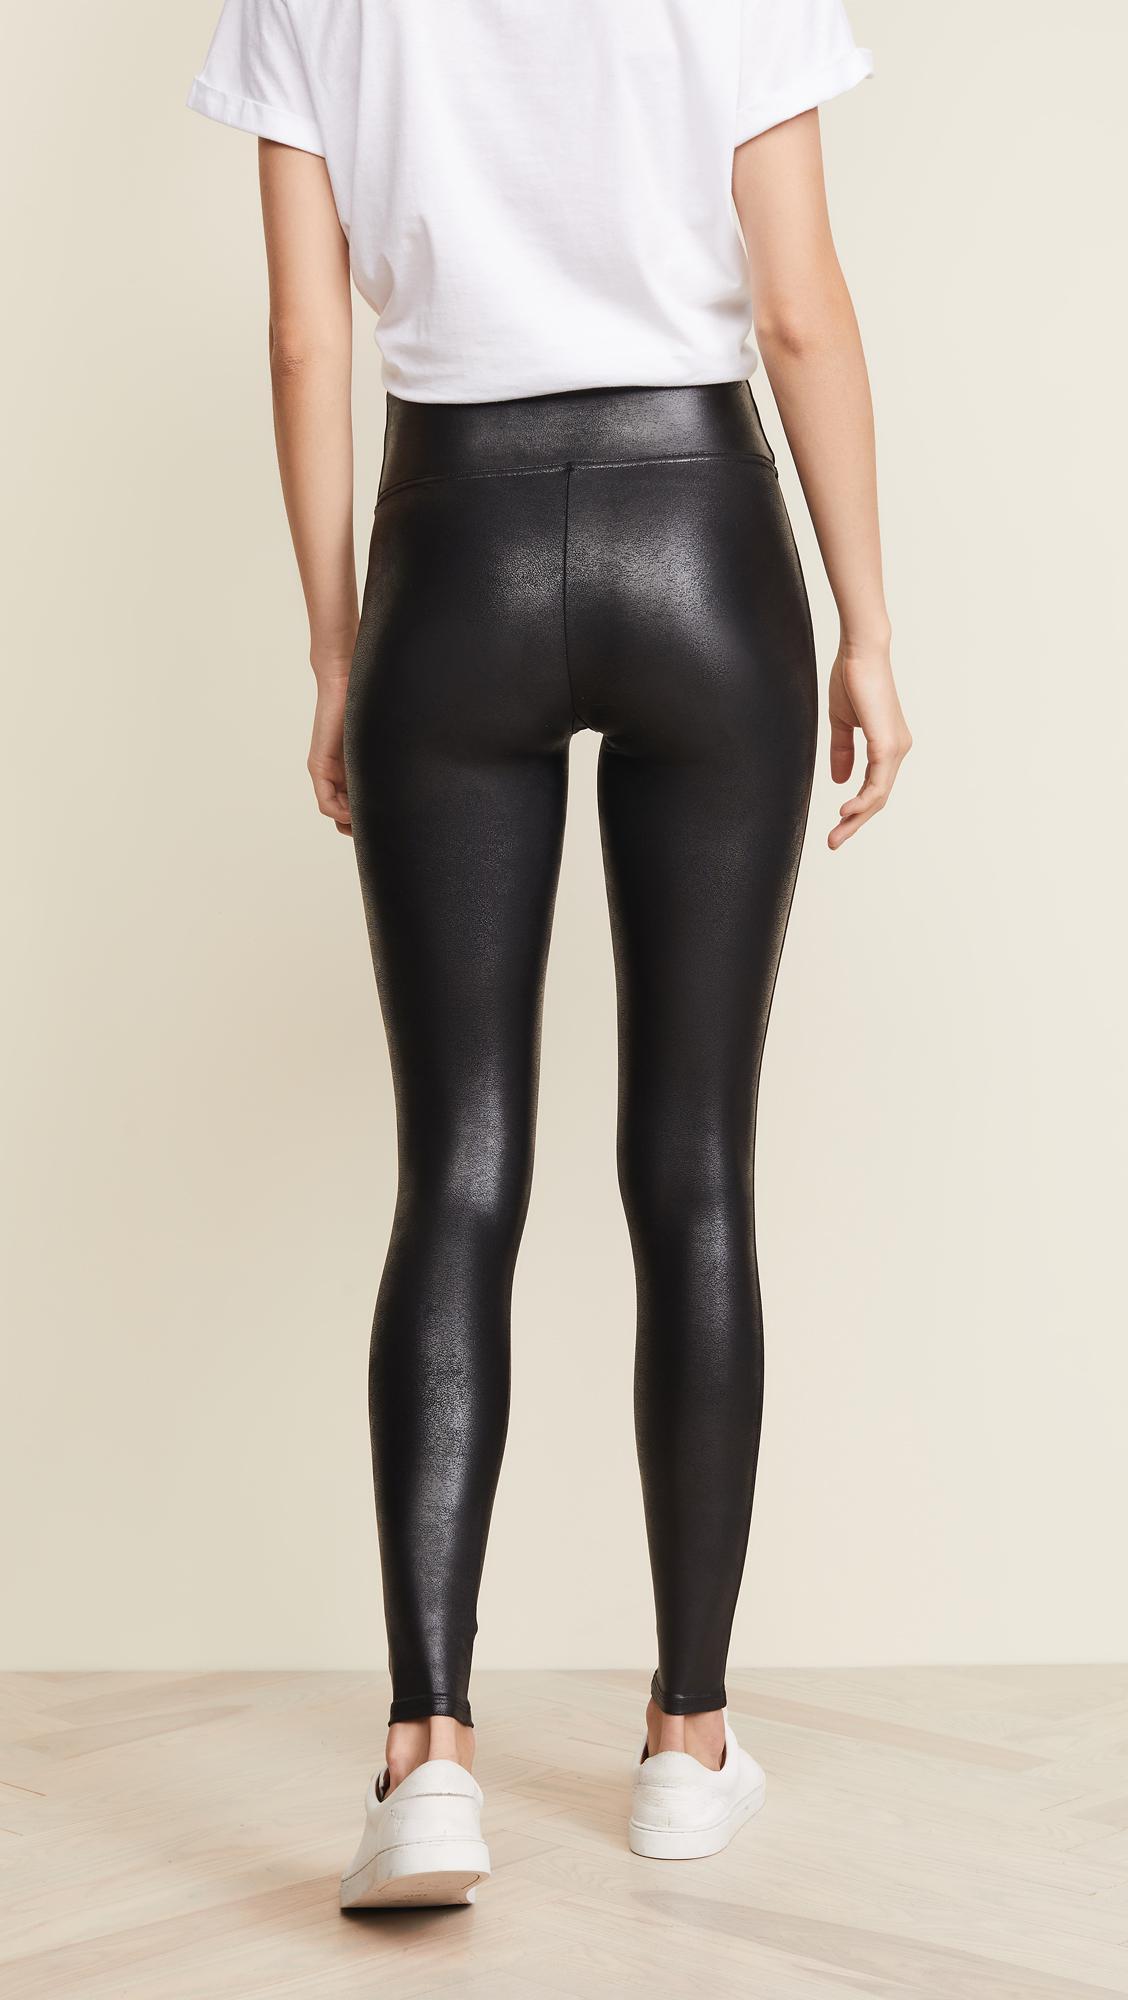 ddd1f80e59948 Spanx Petite Faux Leather Leggings in Black - Lyst